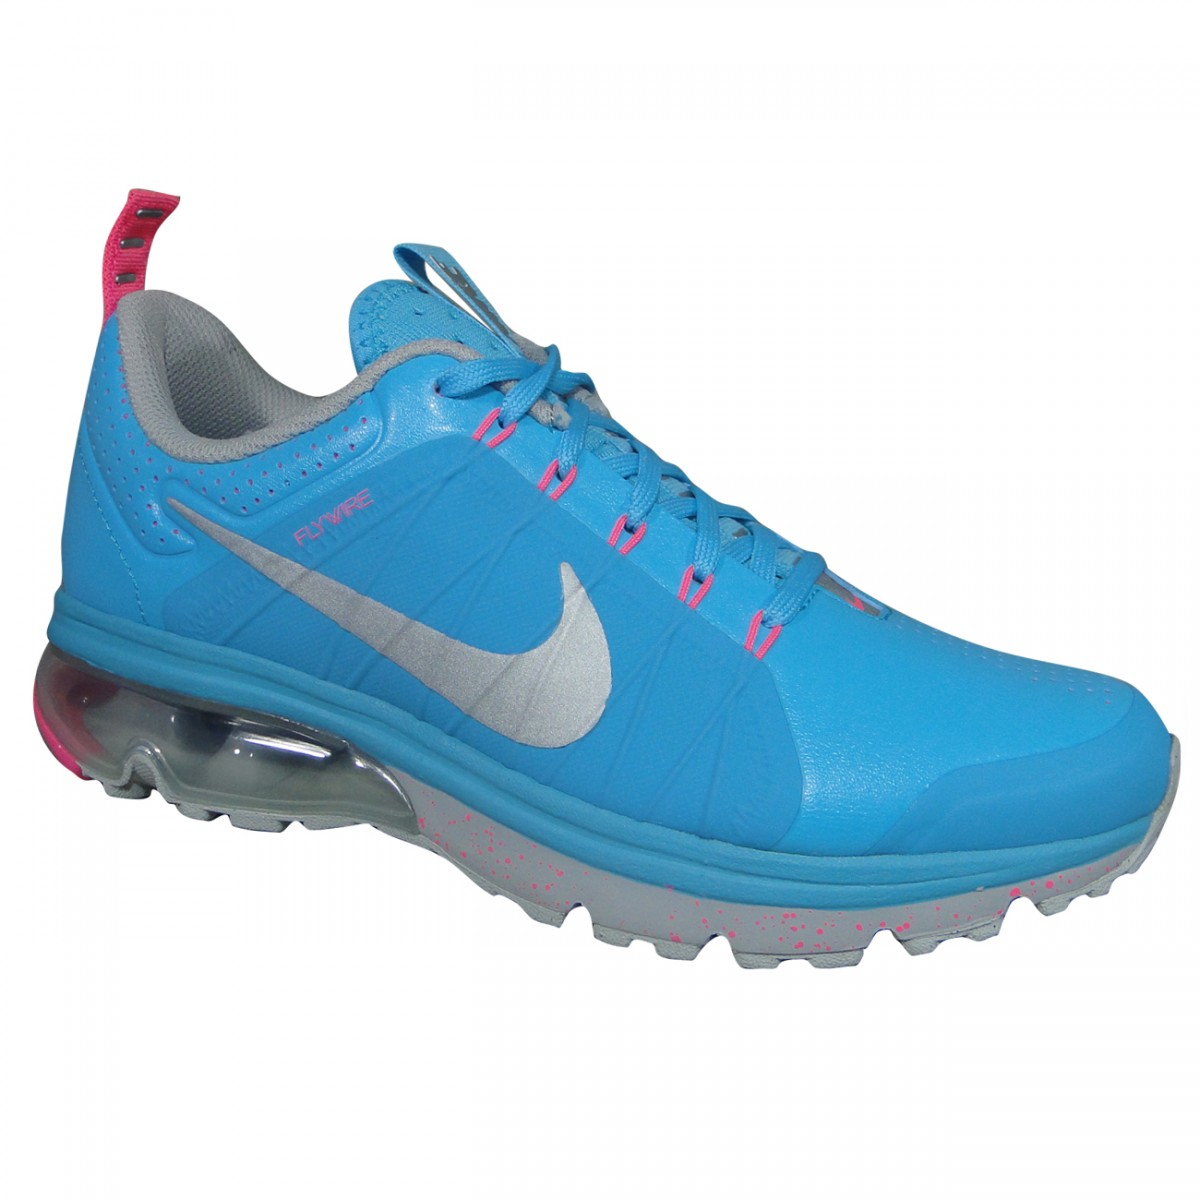 383408a2be Tenis Nike Air Max Supreme 4 806868 406 - Azul Cinza - Chuteira Nike ...